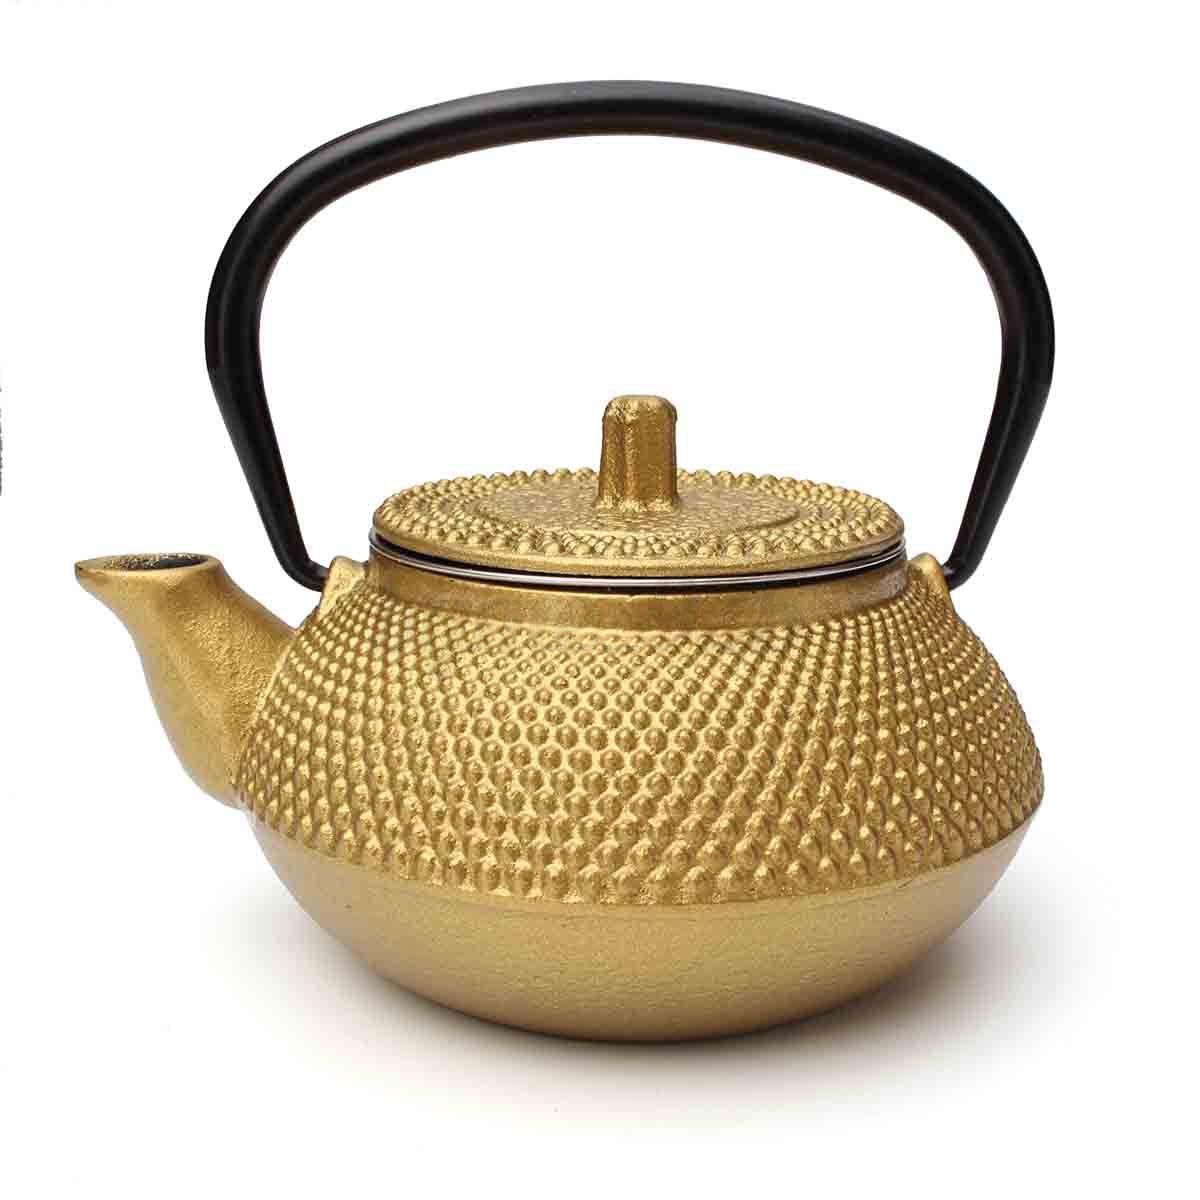 Japanese style cast iron kettle tetsubin teapot comes w strainer tea pot 300ml ebay - Japanese teapot with strainer ...